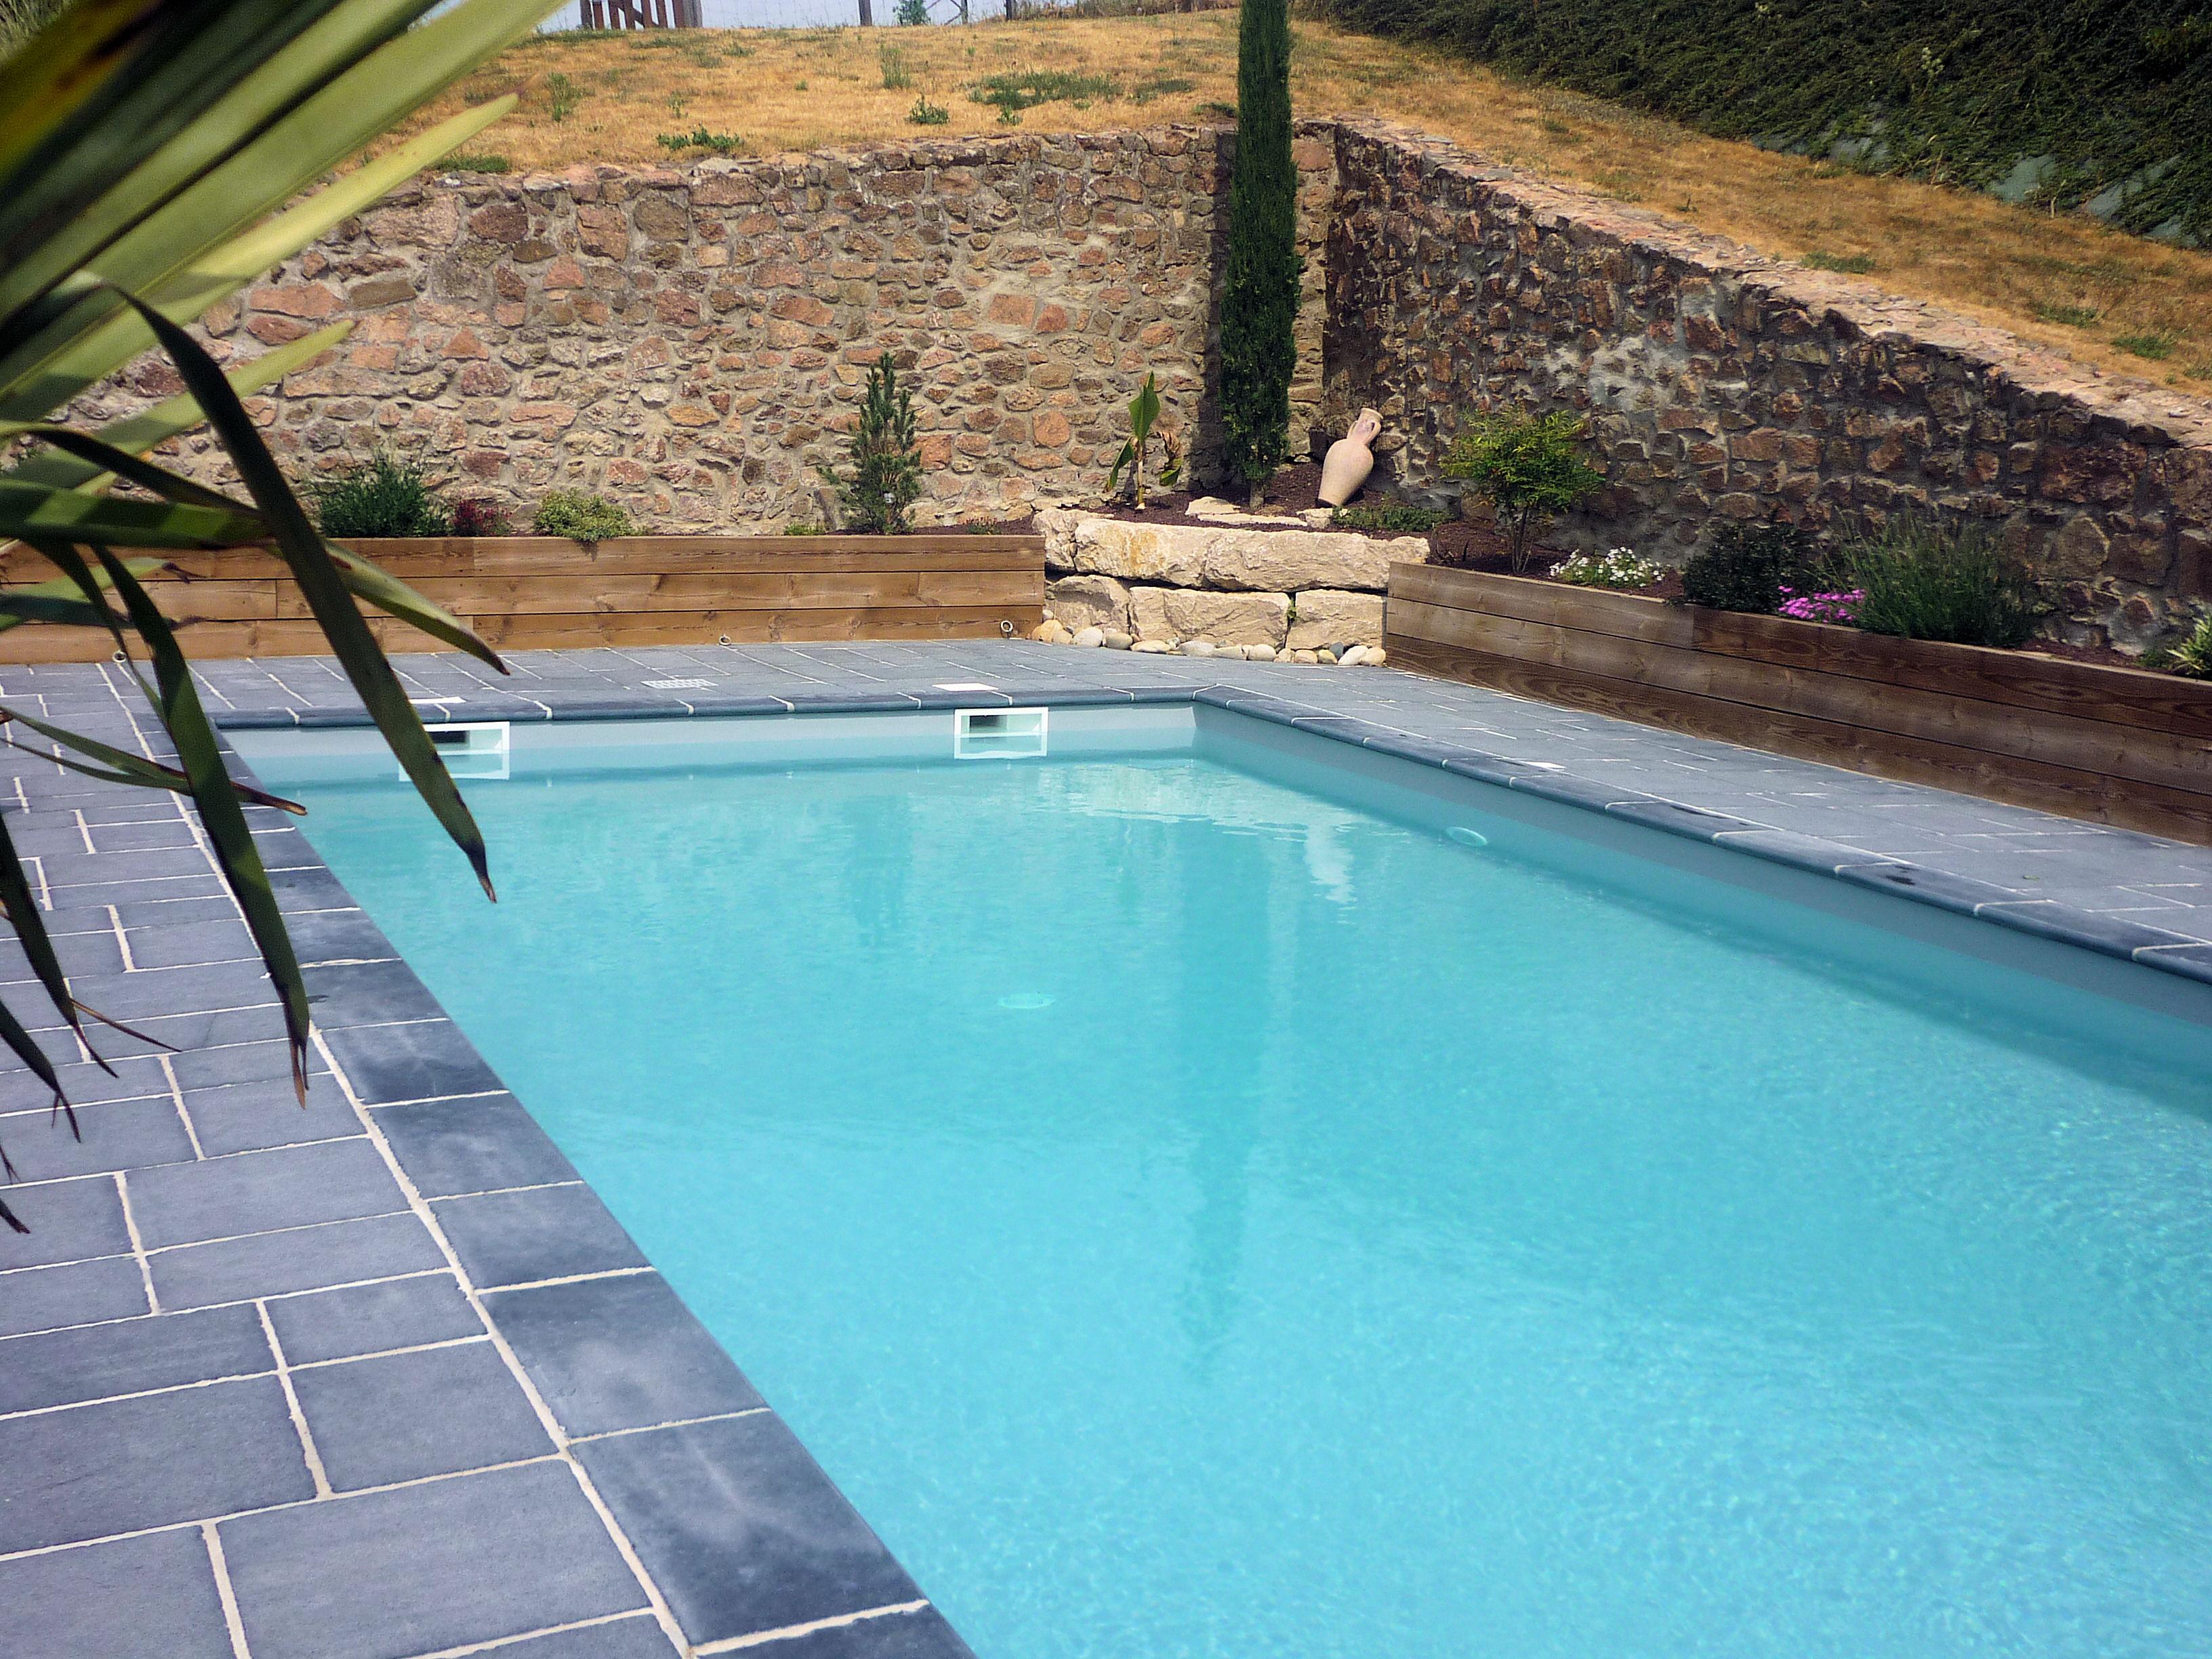 Piscine aux teintes de gris vert et bleu piscine - Piscine gris bleu perpignan ...